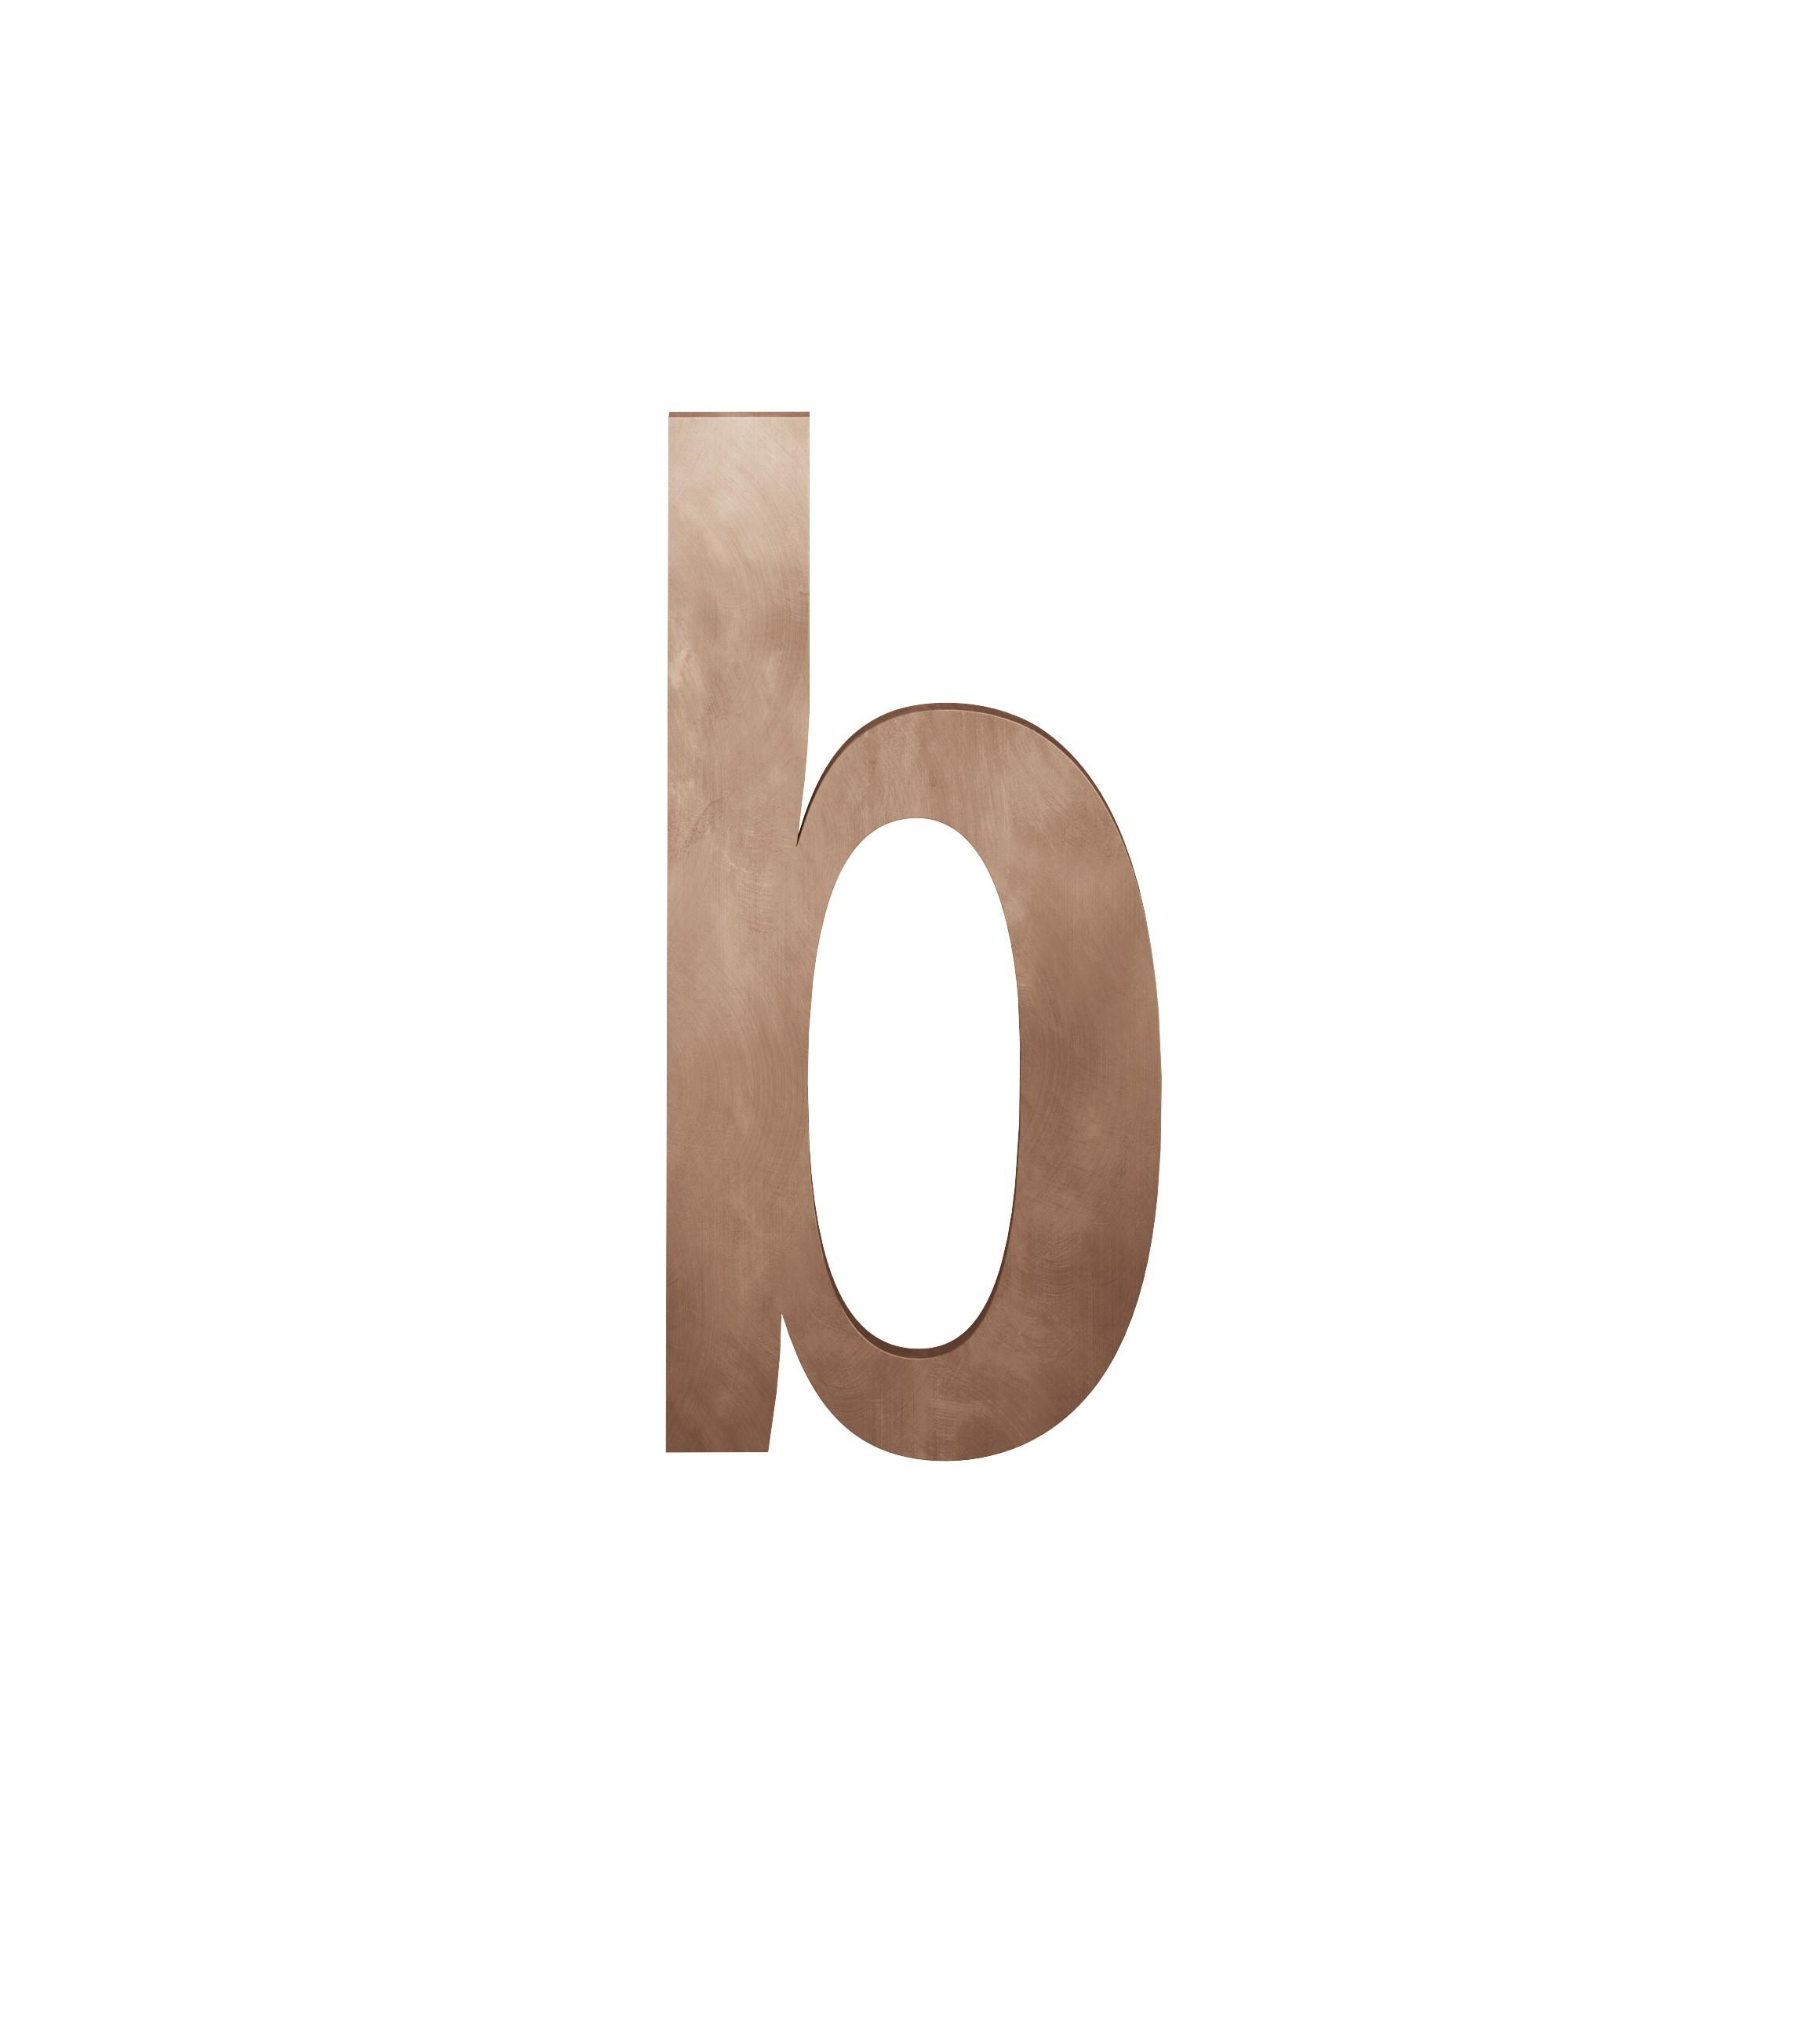 FSB Hausnummer Buchstabe b Bronze (0 38 4005 00012 7615)